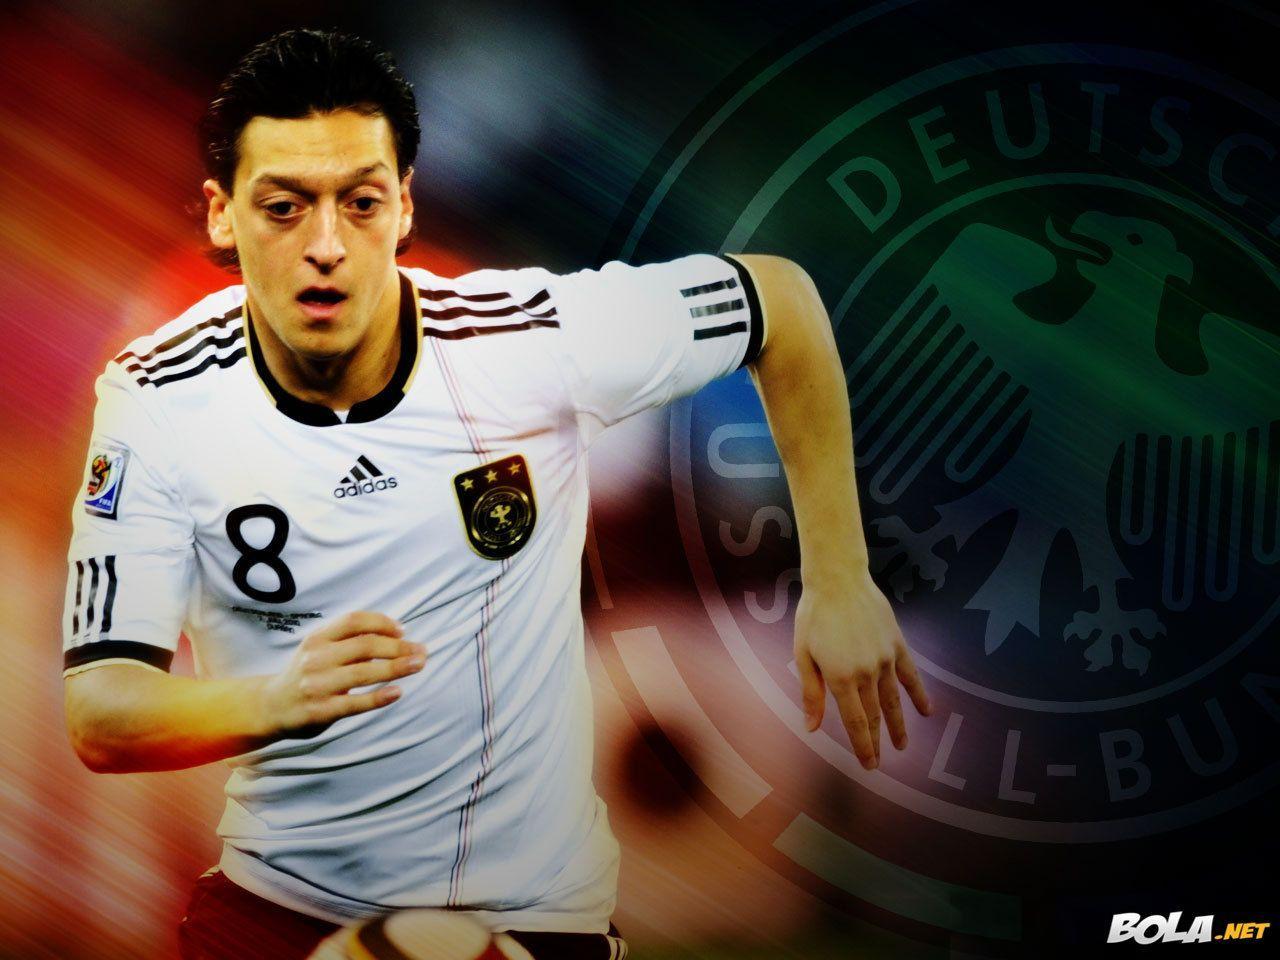 <b>Mesut Ozil Wallpaper</b> online